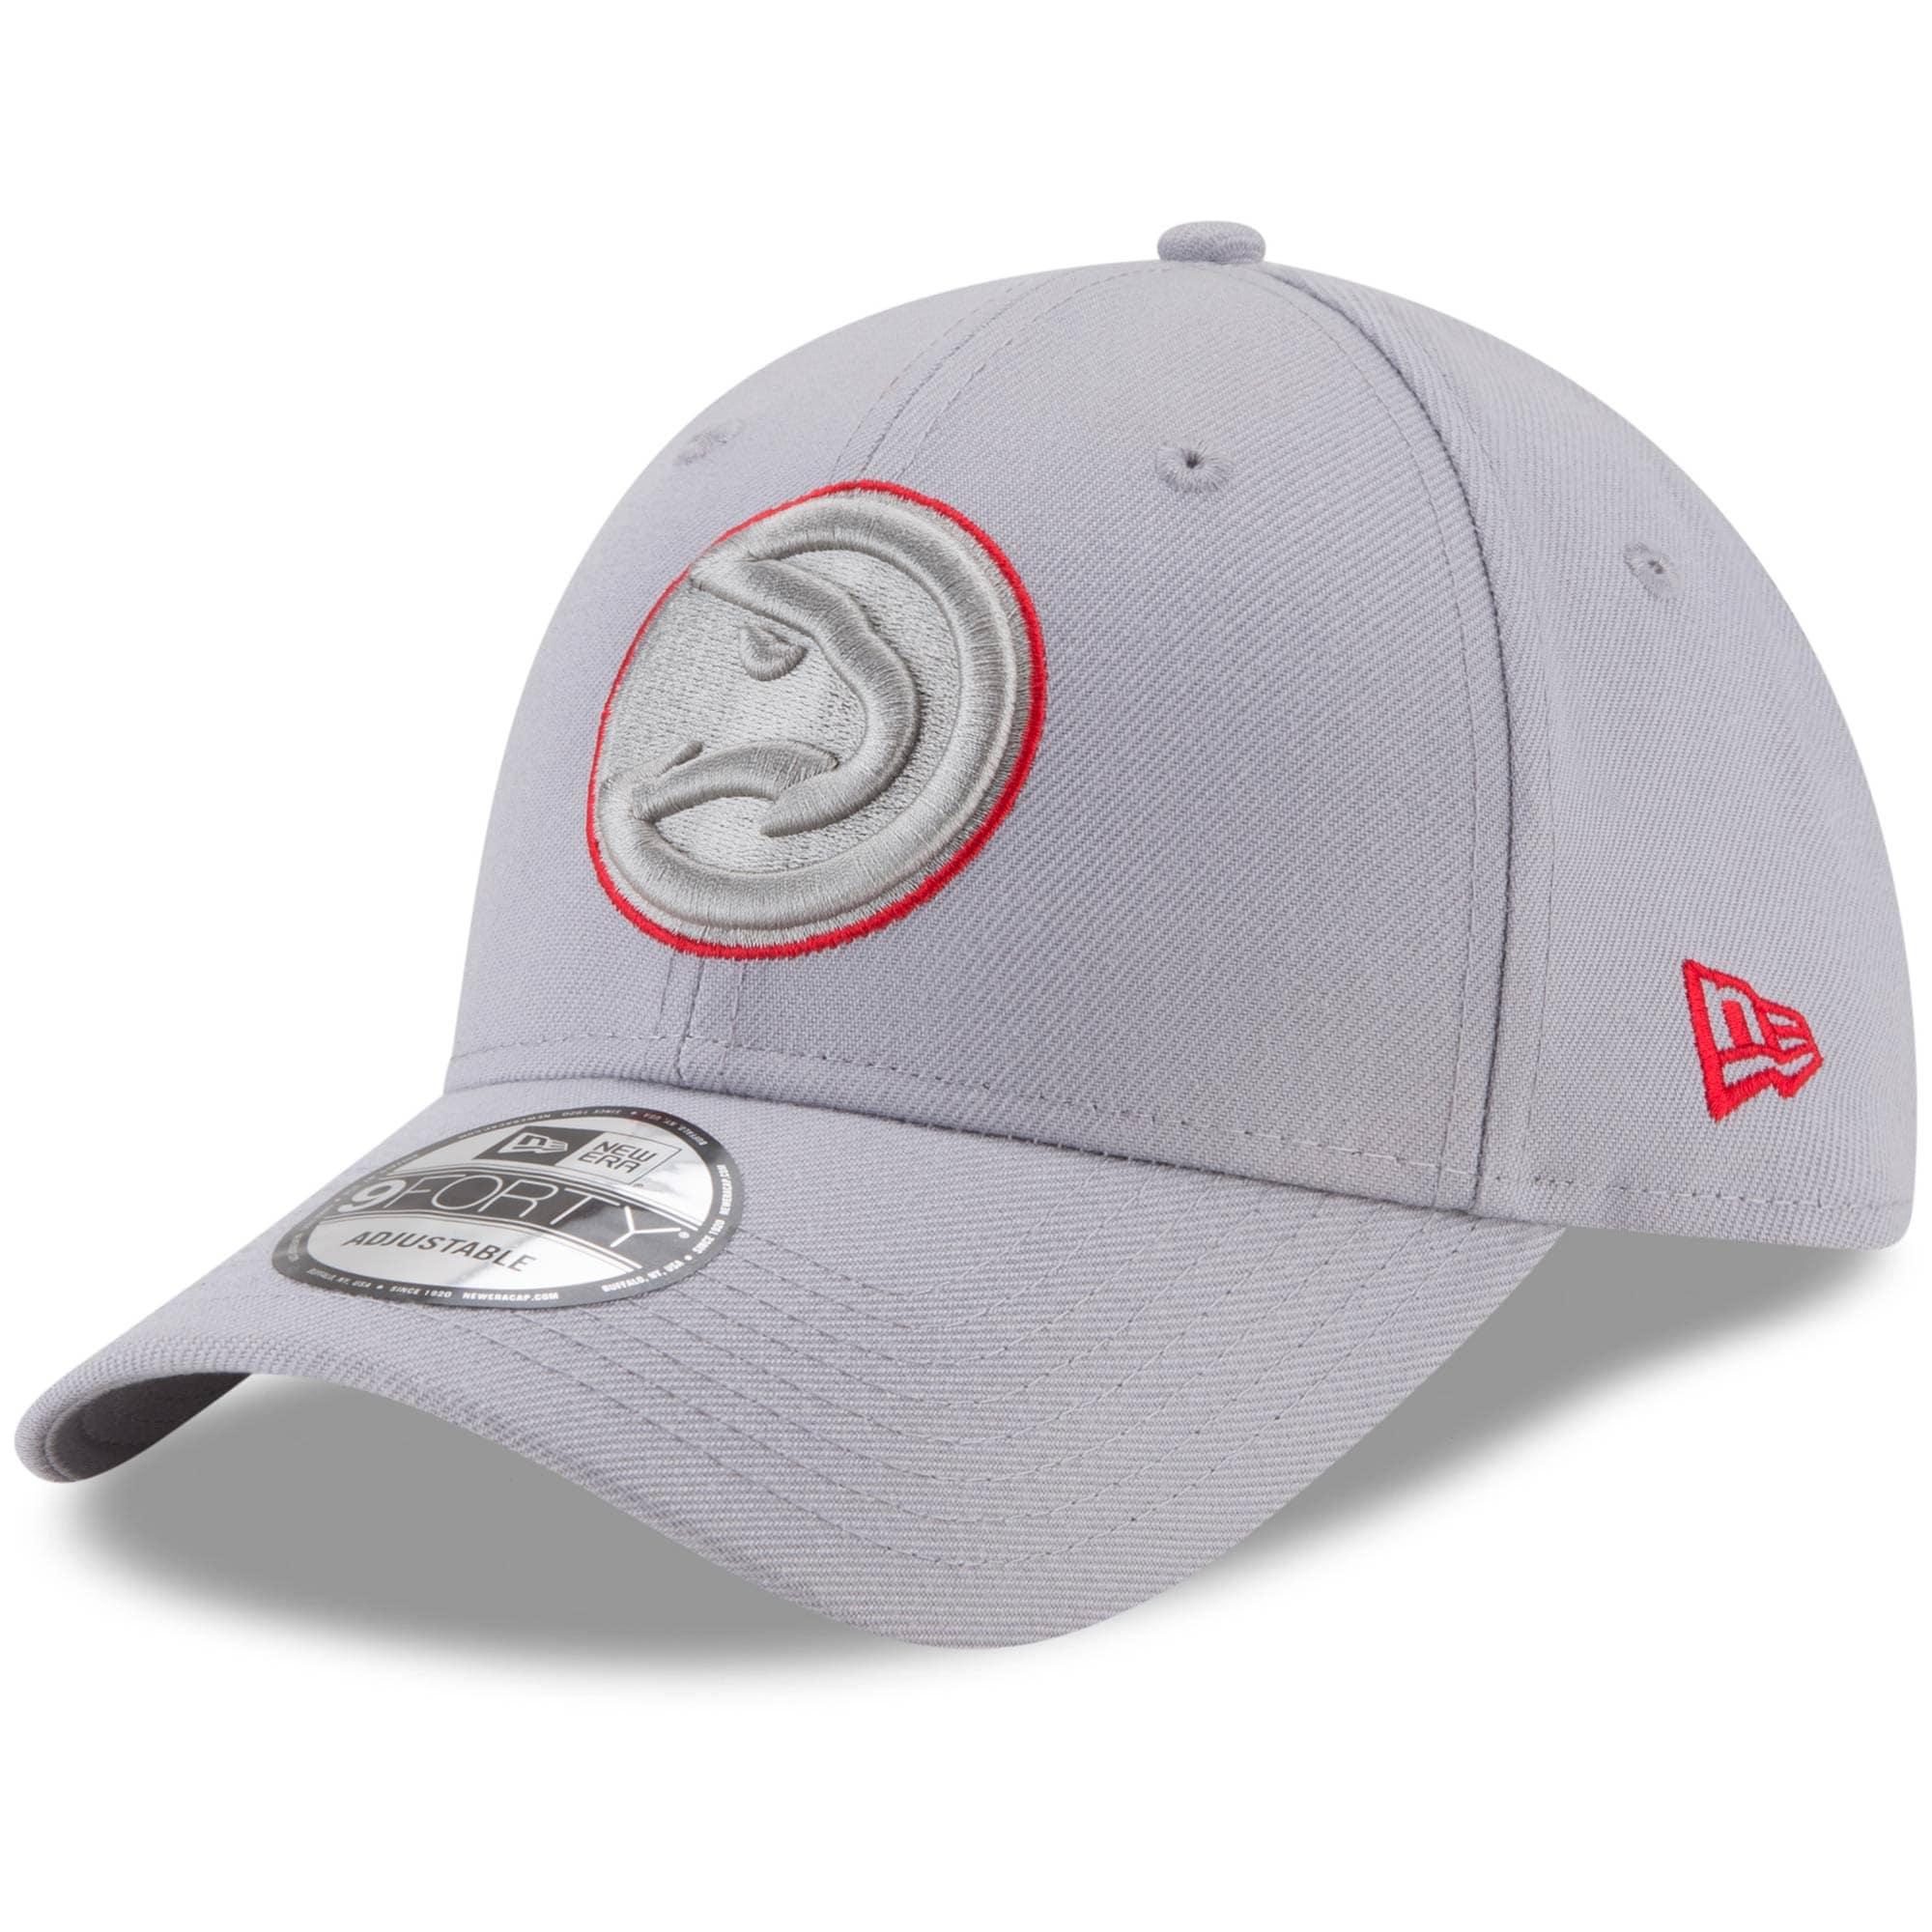 Atlanta Hawks New Era 9FORTY Adjustable Hat - Gray